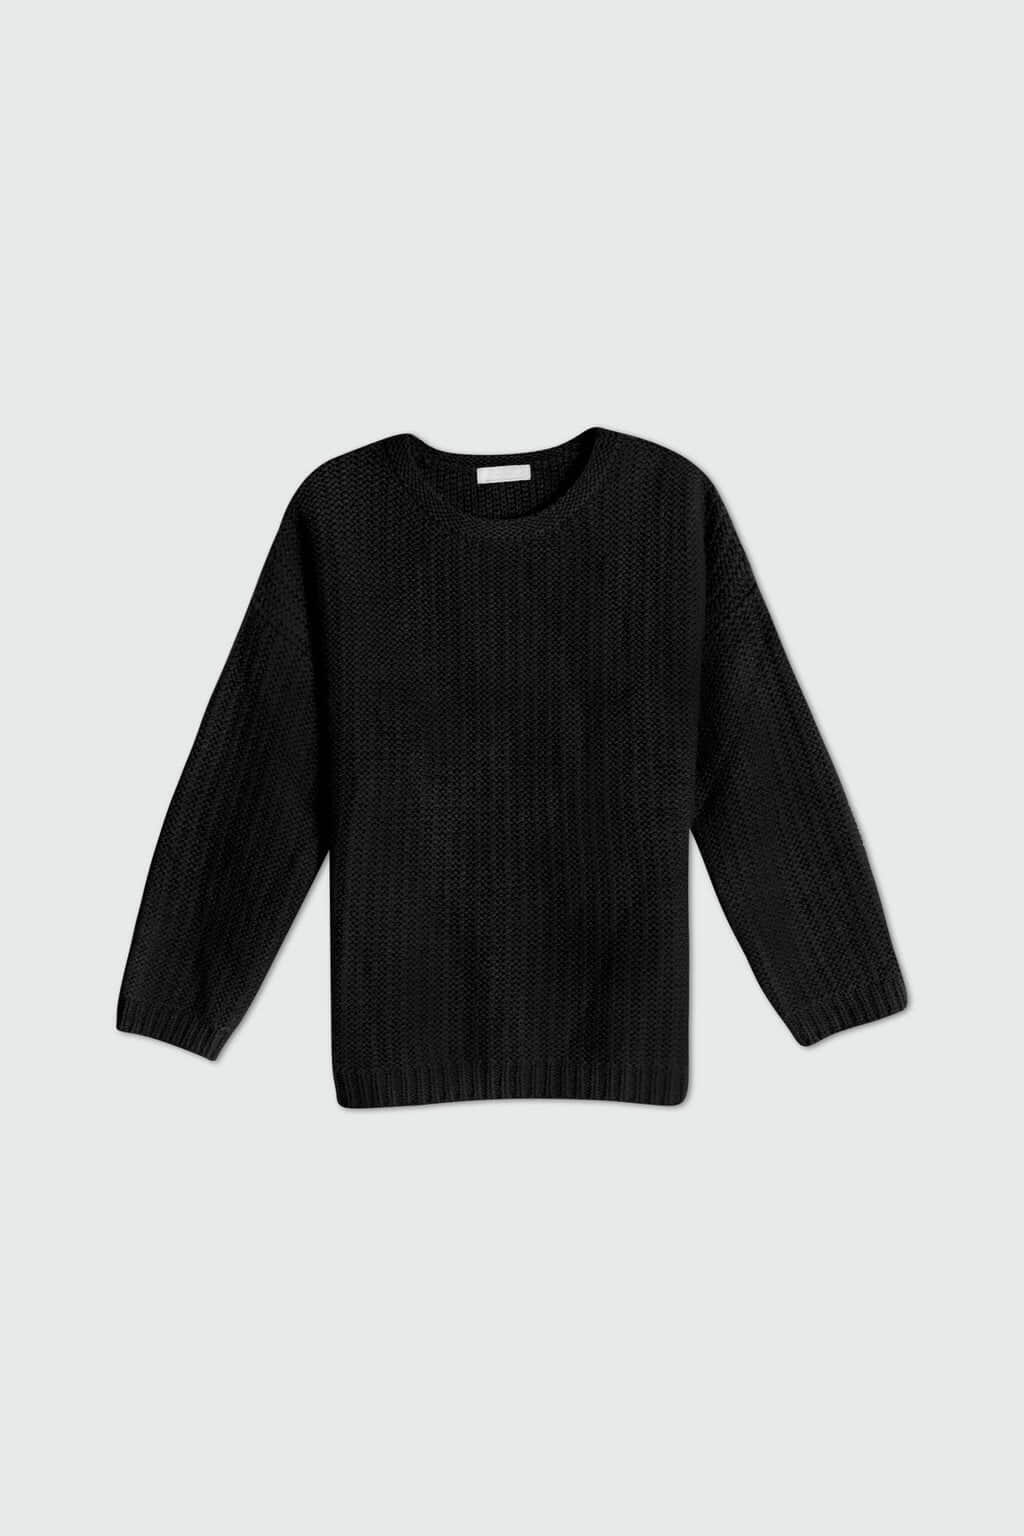 Sweater 2596 Black 12